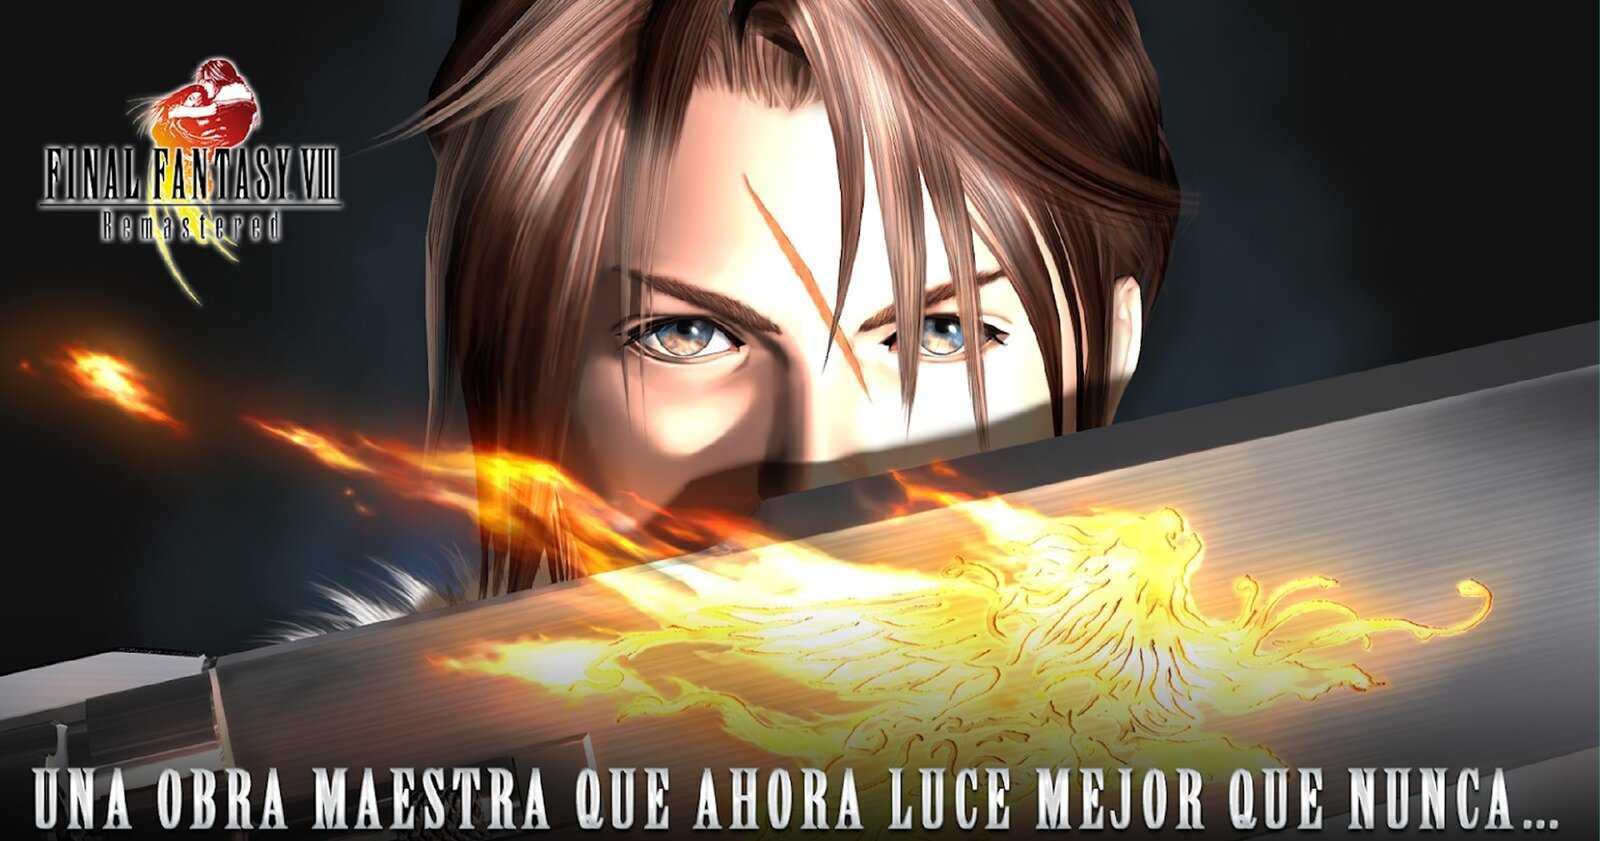 Final Fantasy VIII pour mobile